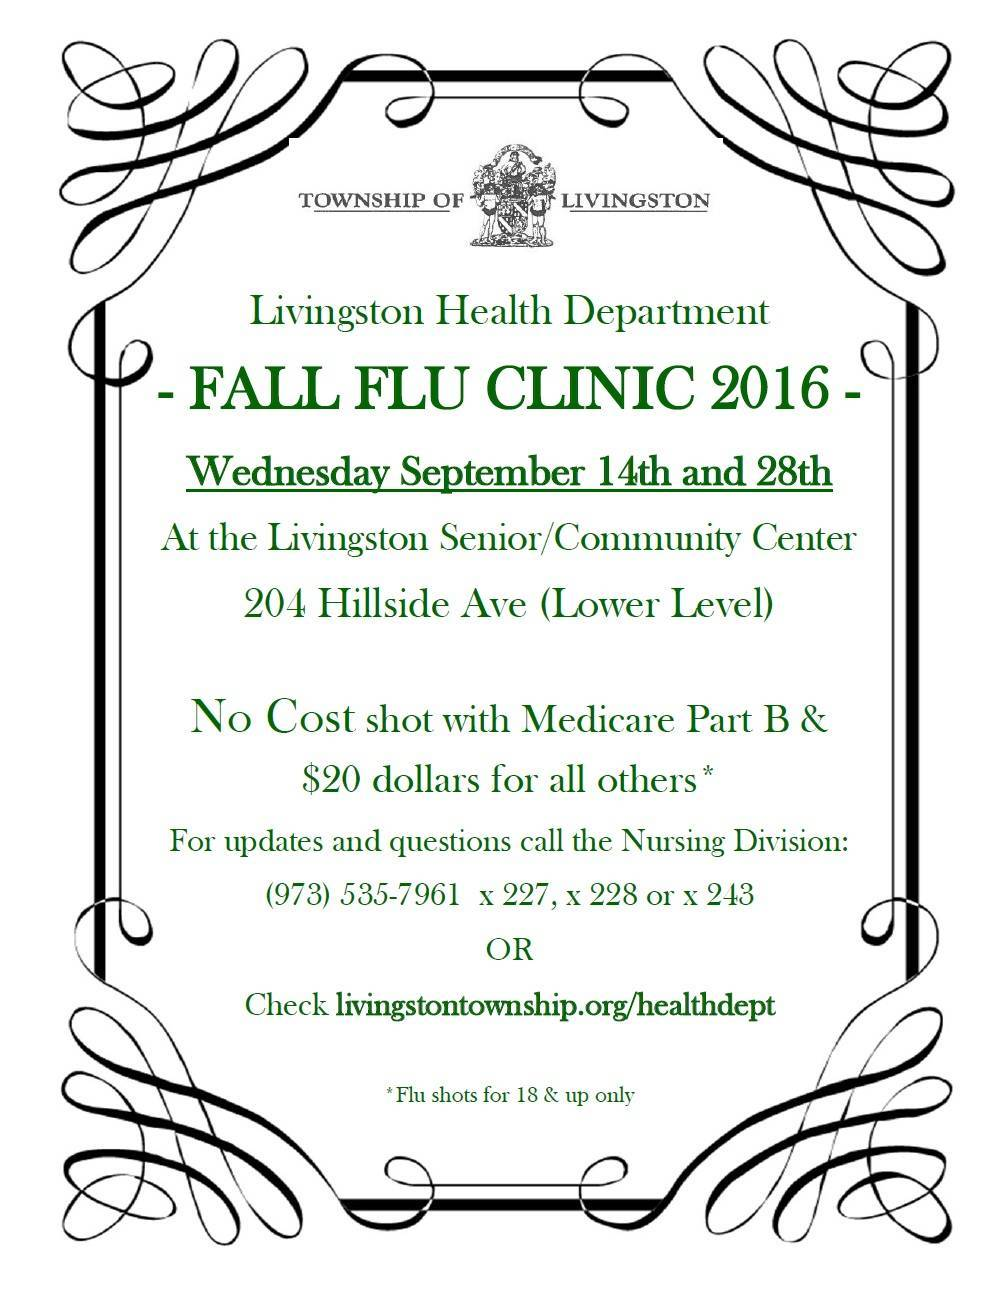 58bf03a3dceb7673744a_2016_Fall_Flu_Clinic_Flyer_for_website.jpg